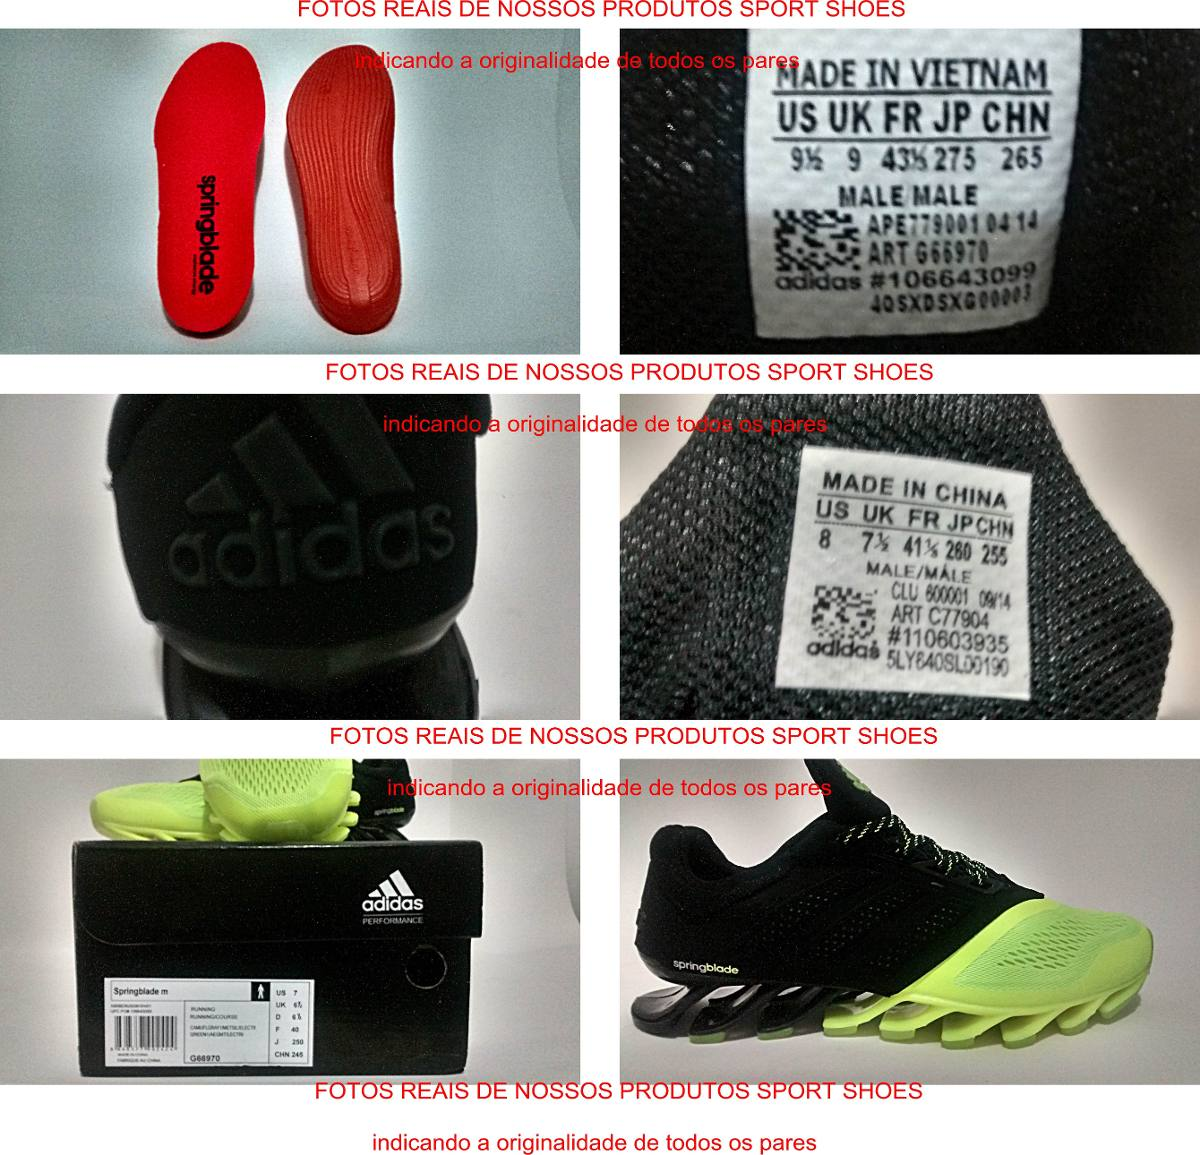 Adidas primavera lama drive 2, lancamento originale frete gratis.